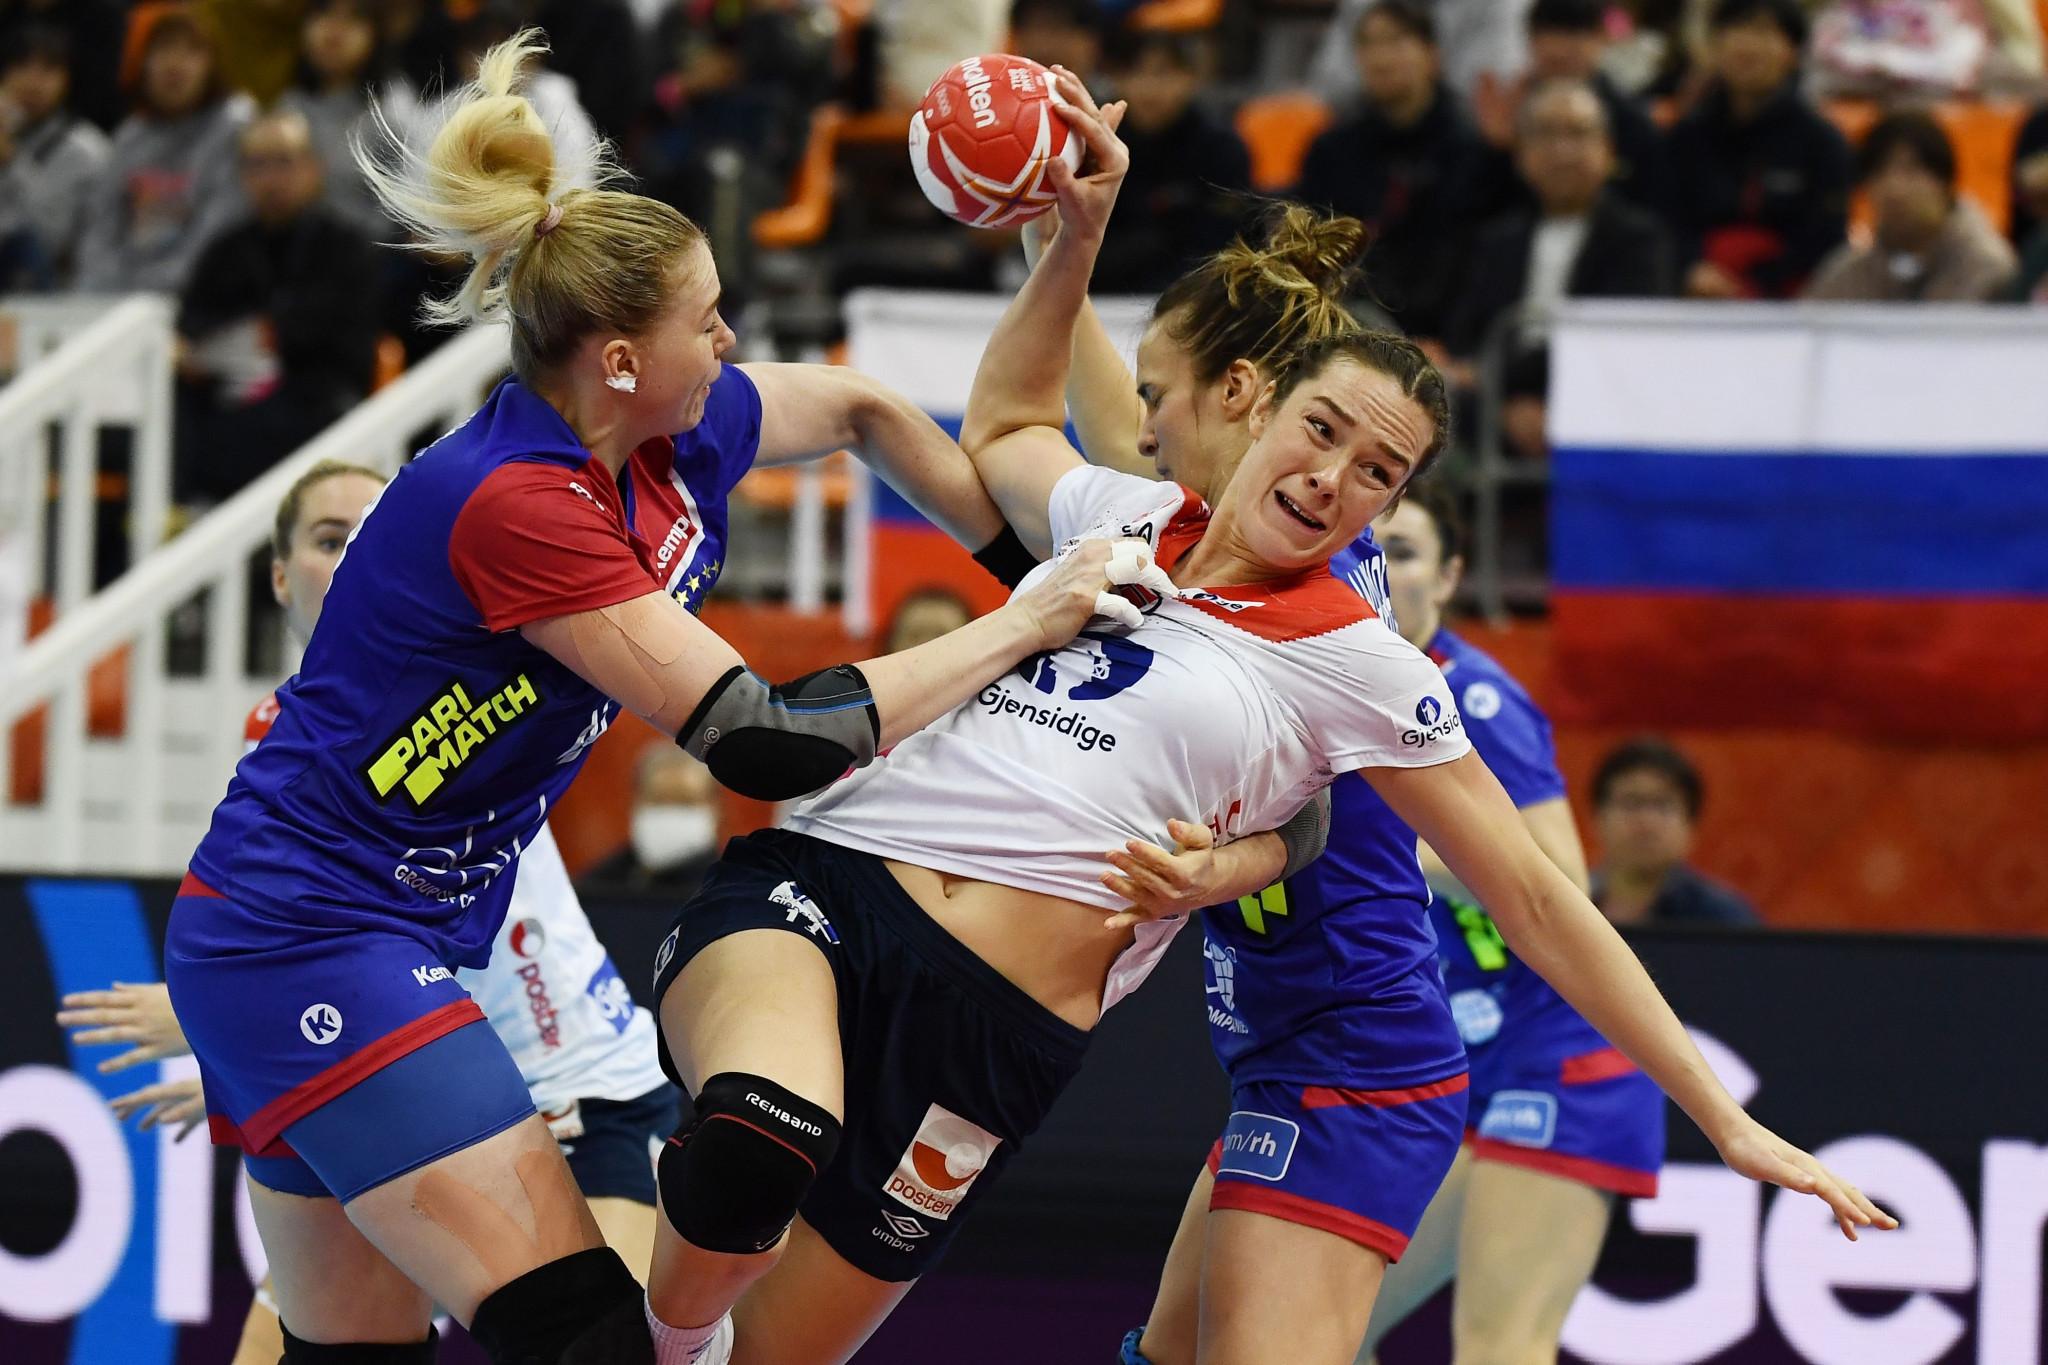 Norway pulls out of hosting matches at European Women's Handball Championship due to coronavirus pandemic